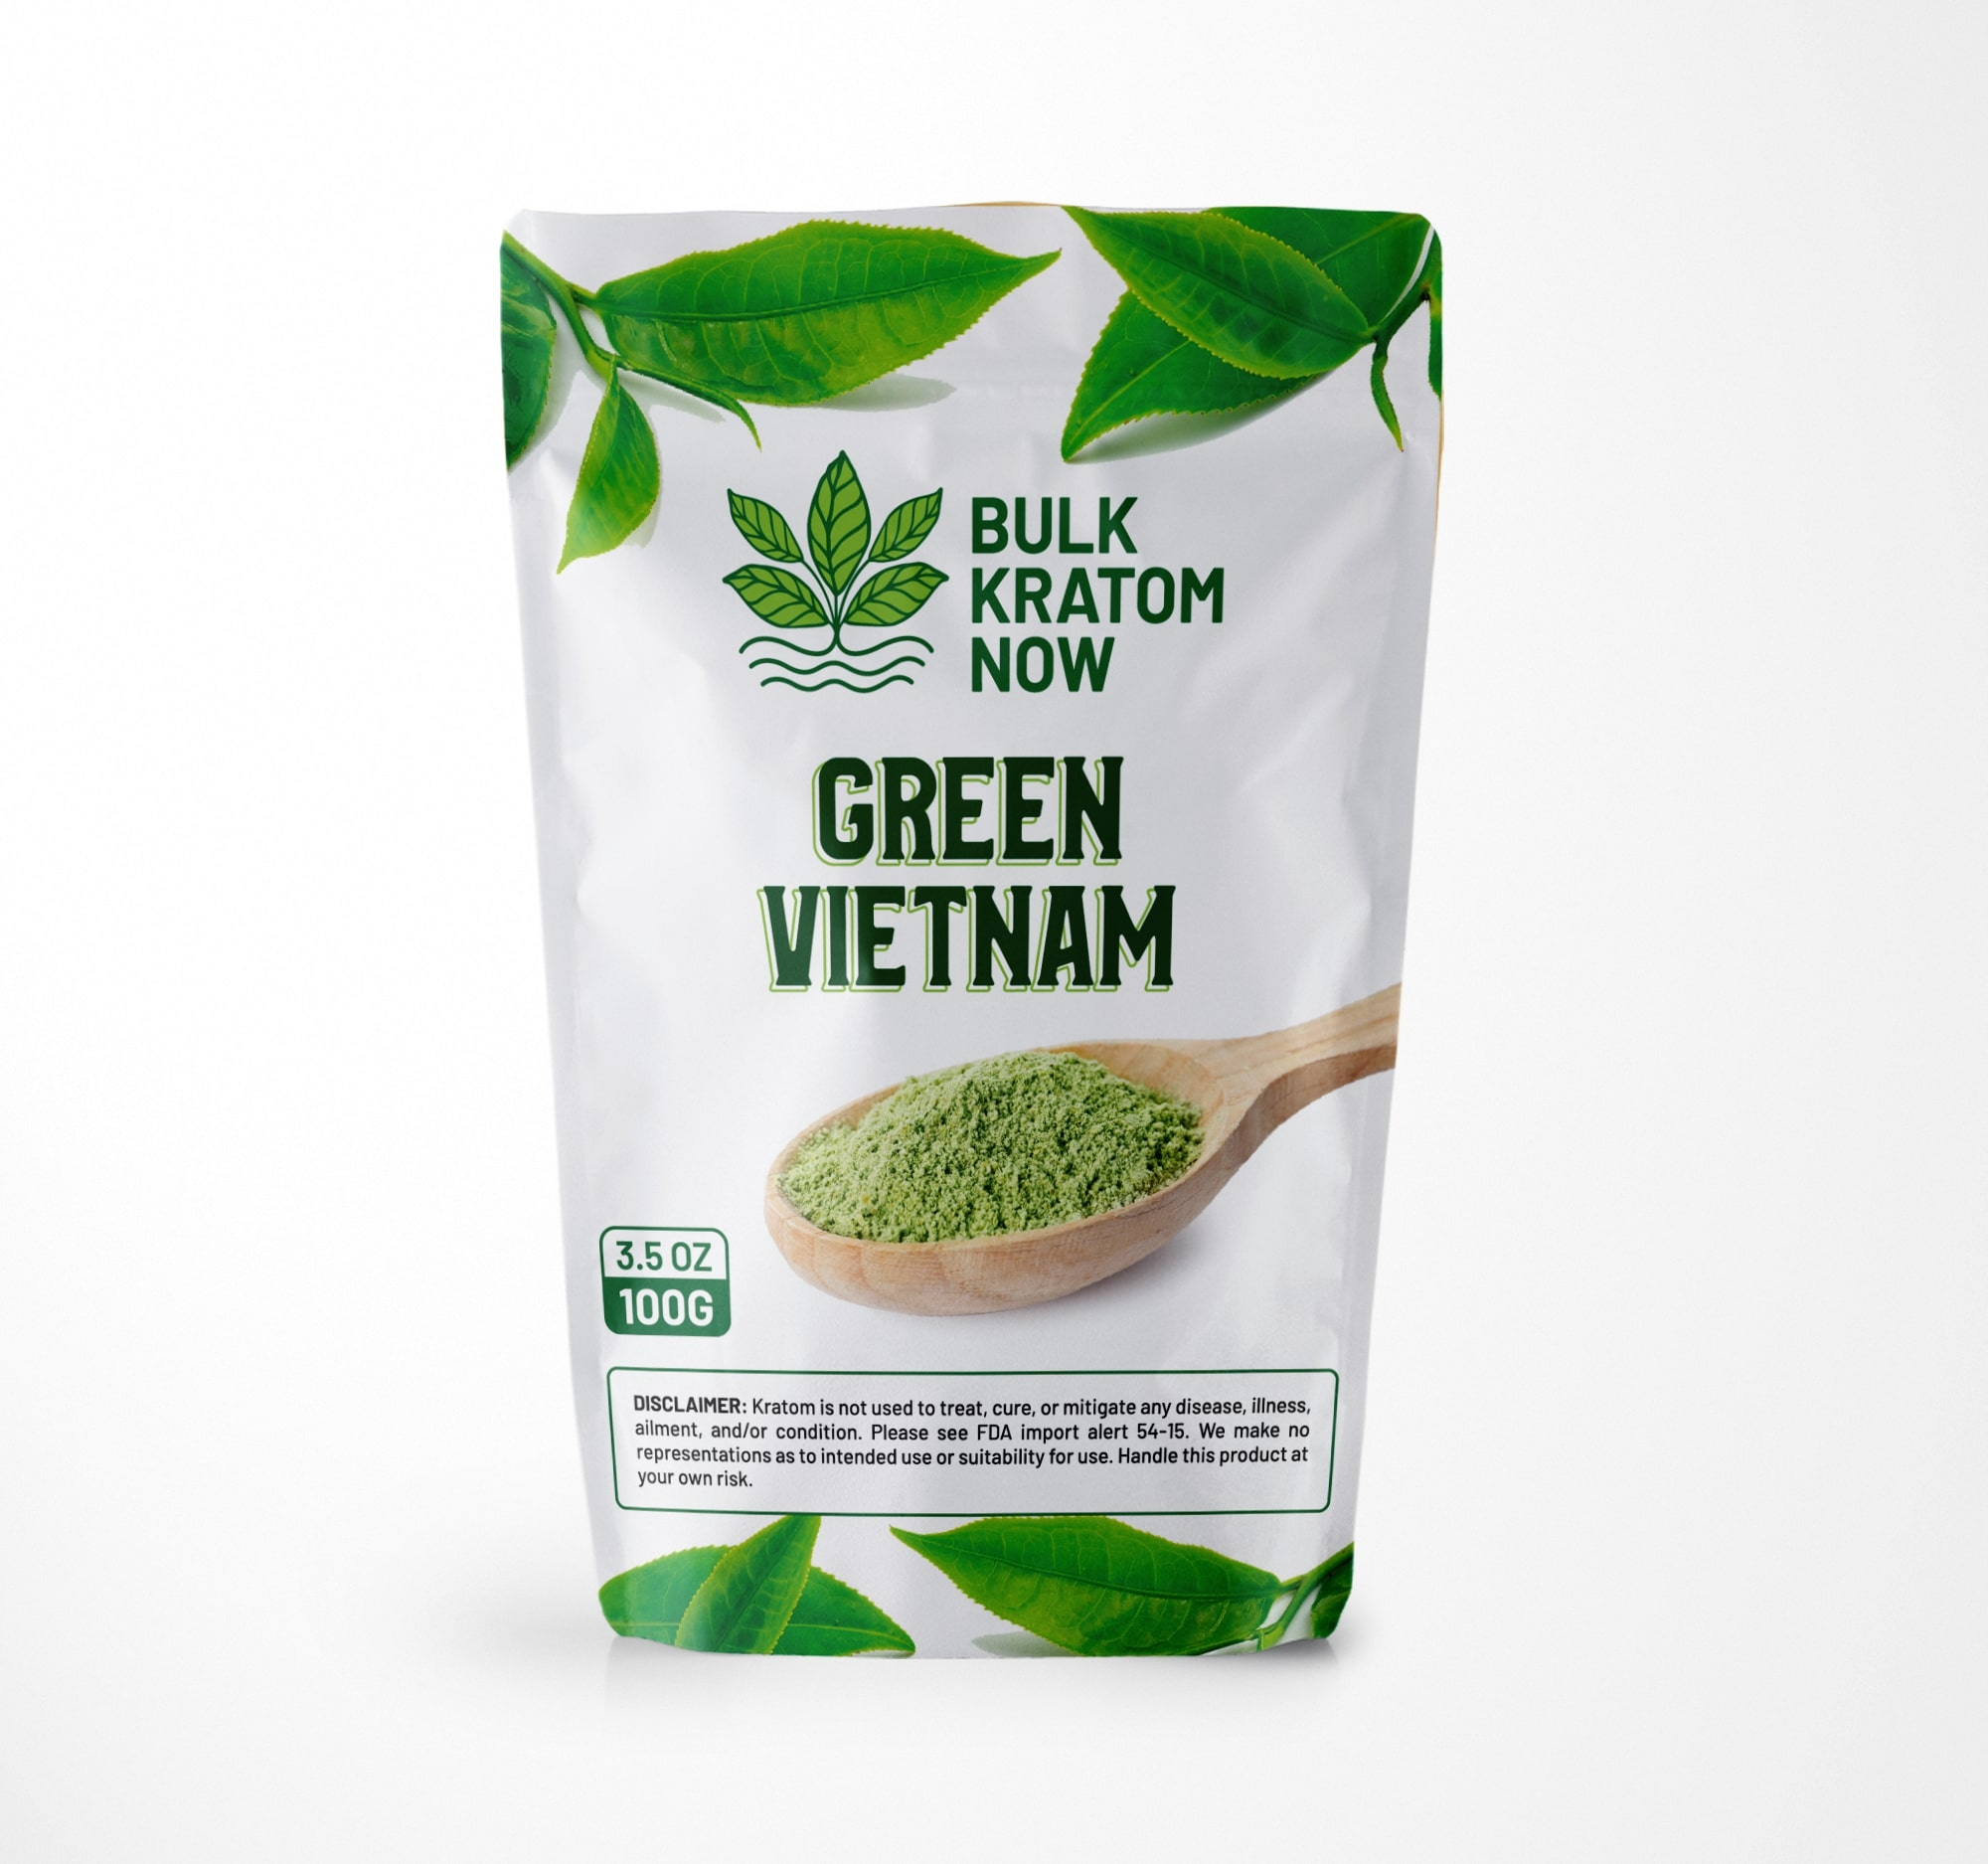 Green Vietnam Bulk Kratom